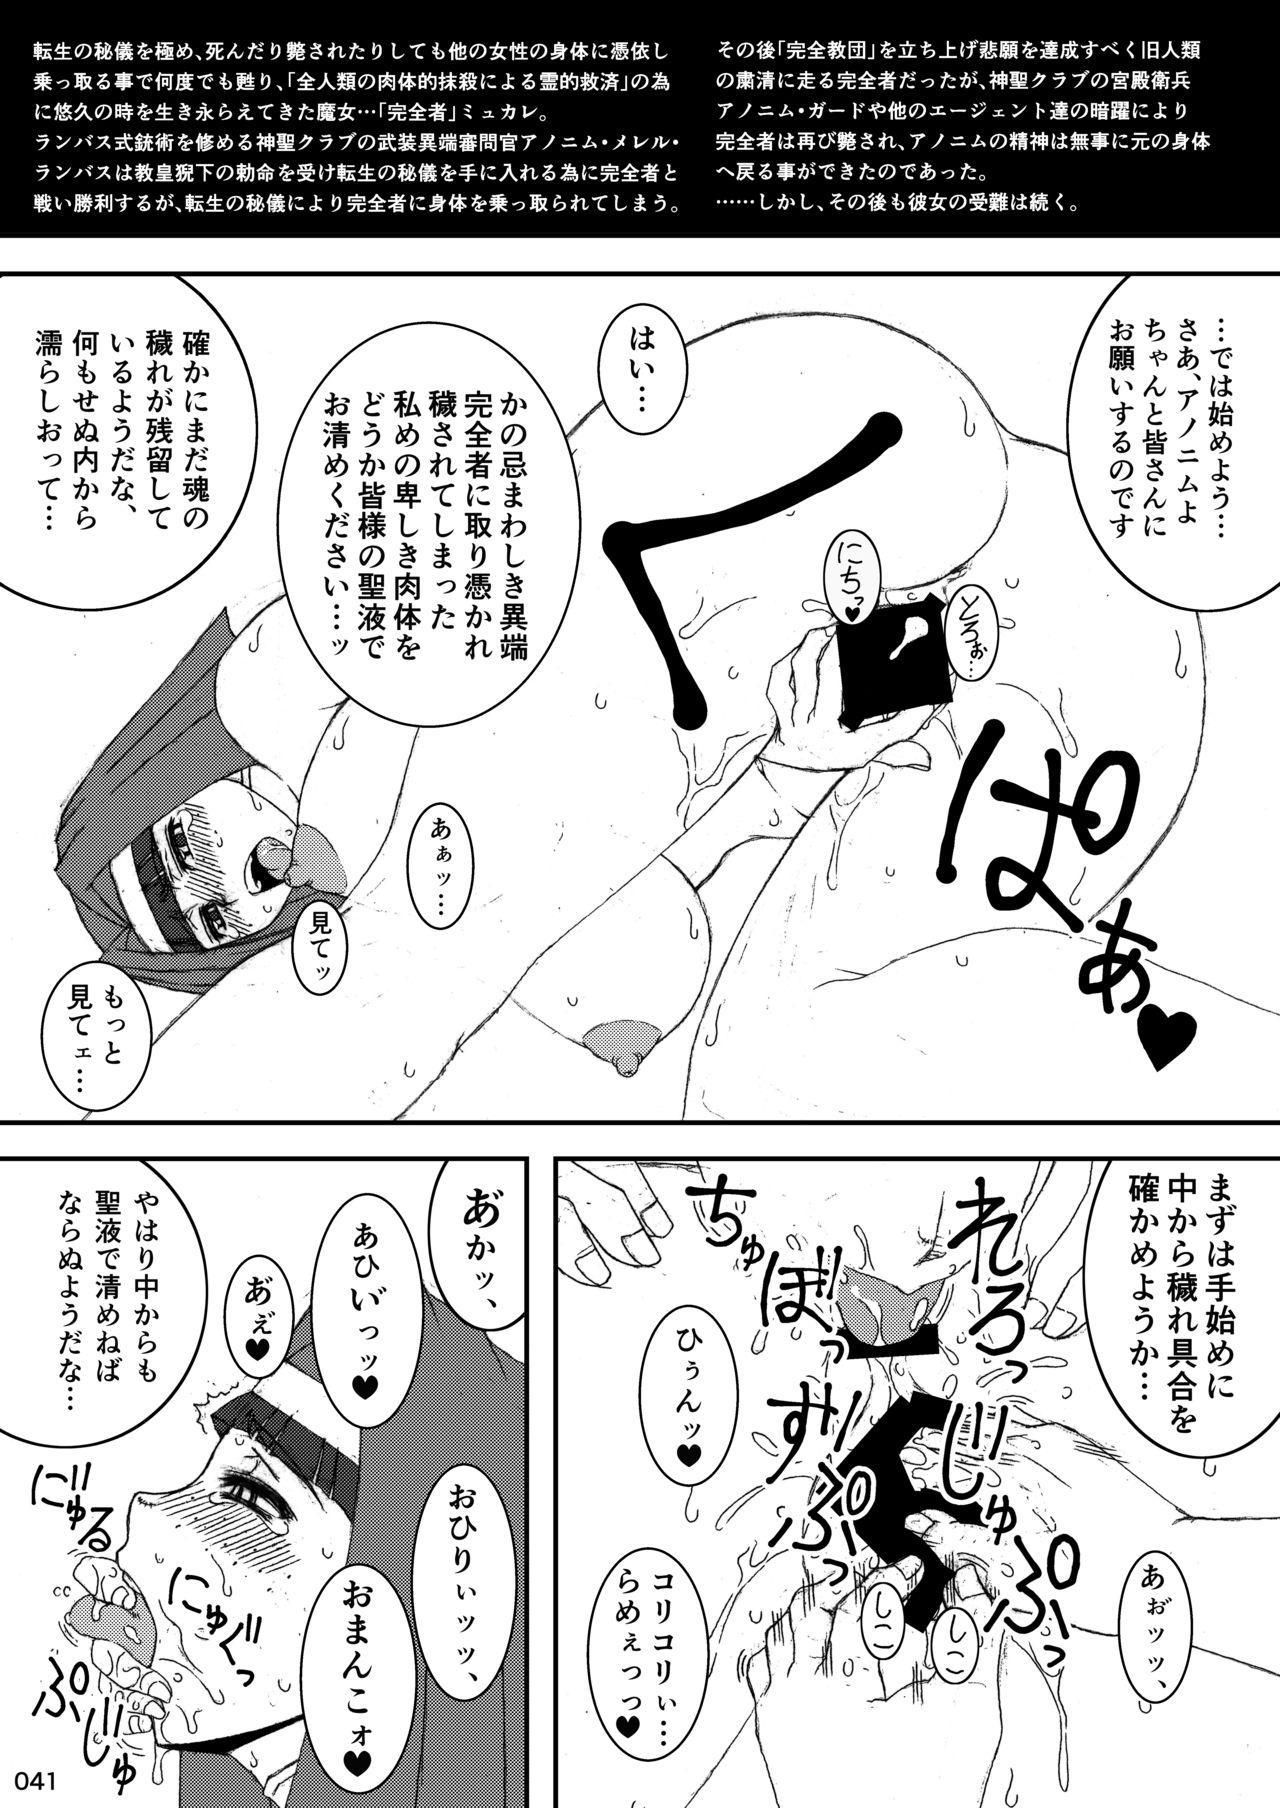 Akatsuki Blitzkampf & EN-1 Perfekt Welt Gangbang Anthology 40